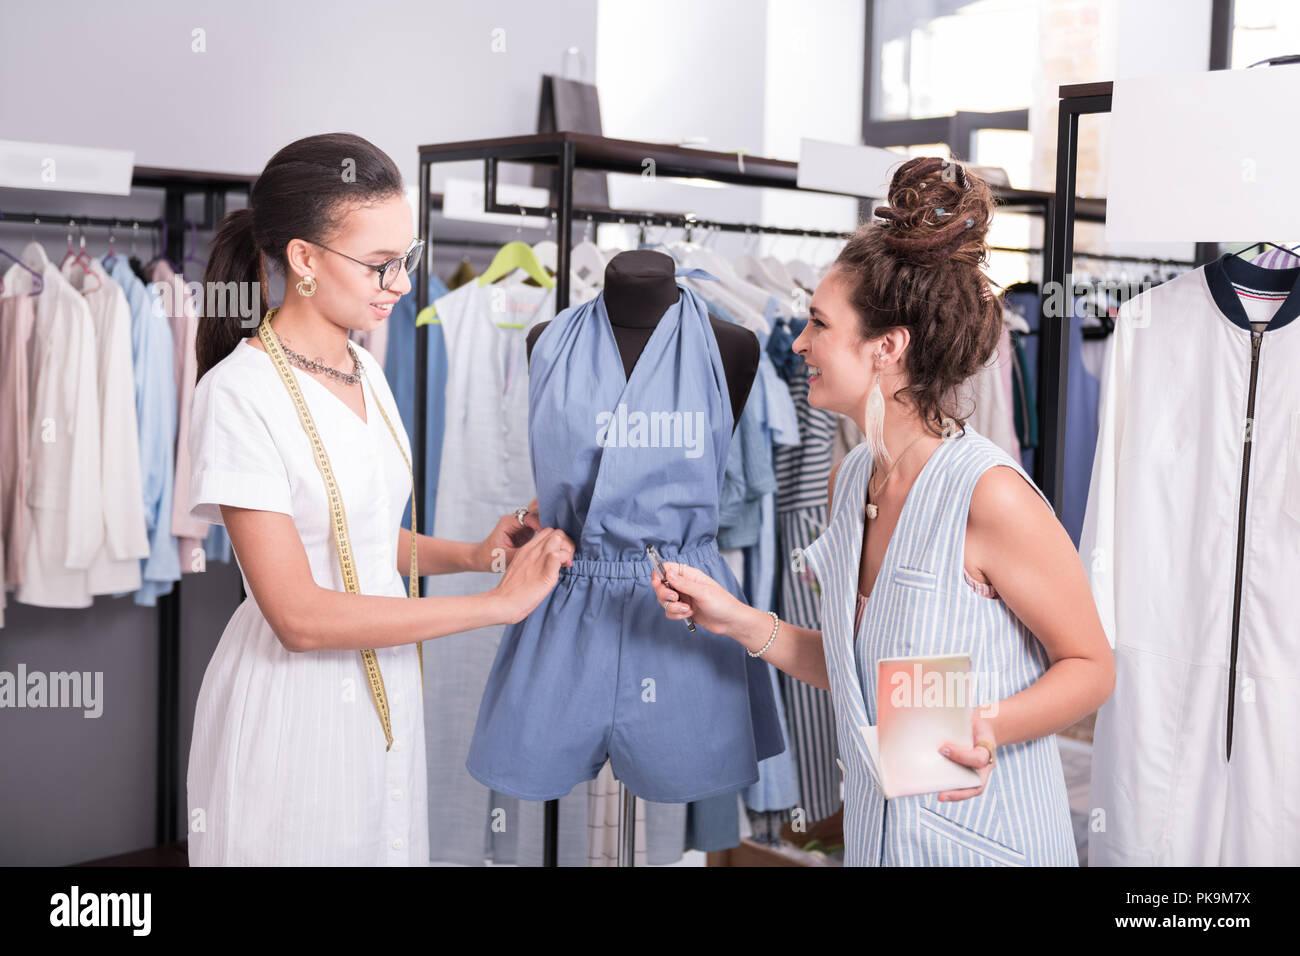 Frohe zwei Designer diskutieren Overalls im Showroom Stockbild